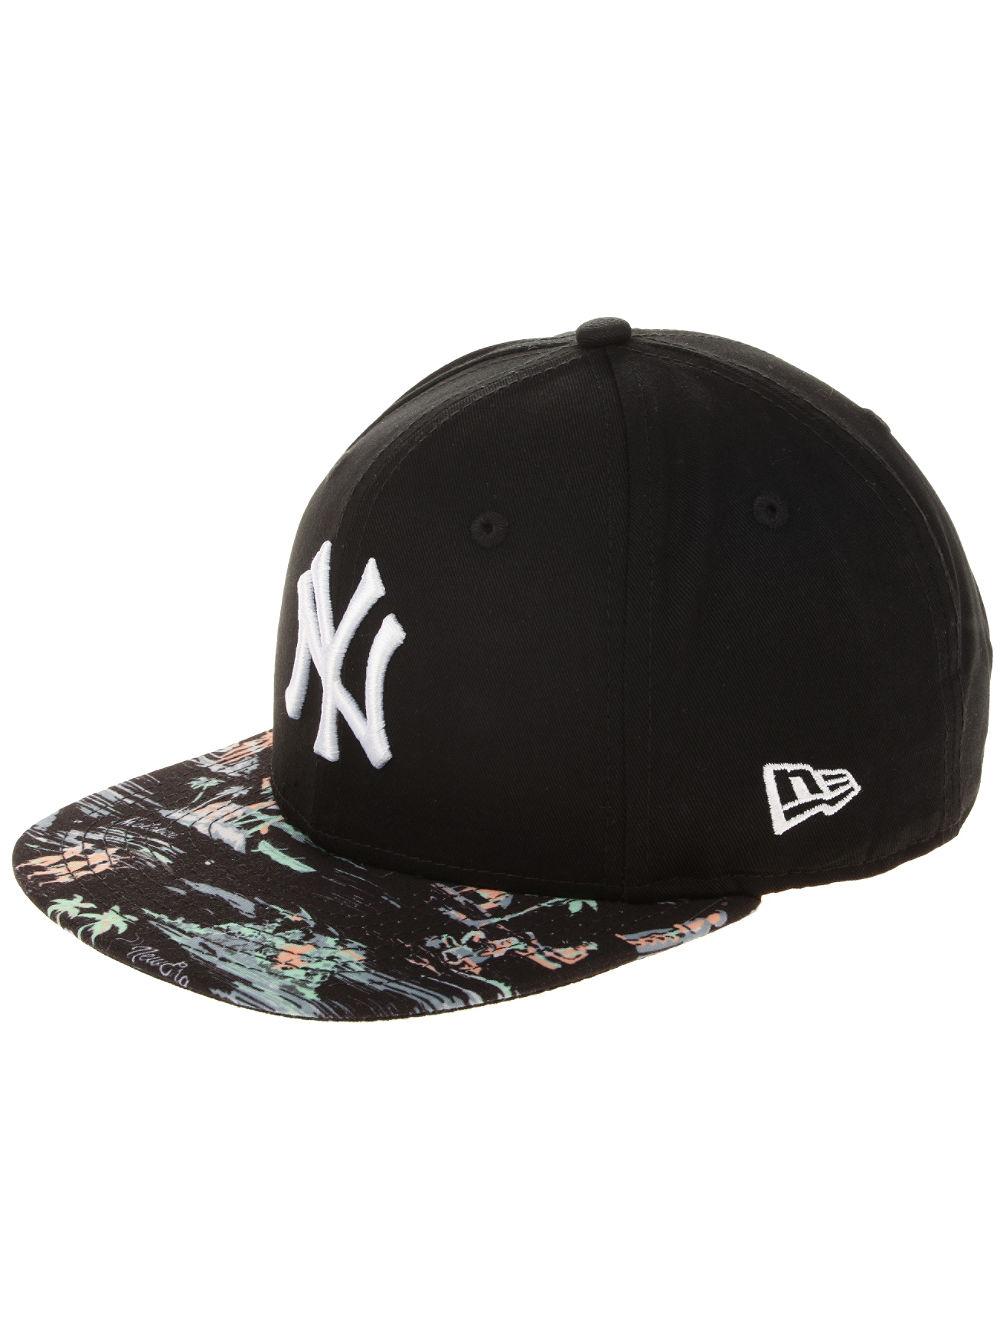 Buy New Era Offshore Visor MLB NY Yankees Cap online at blue-tomato.com 415036c0b90